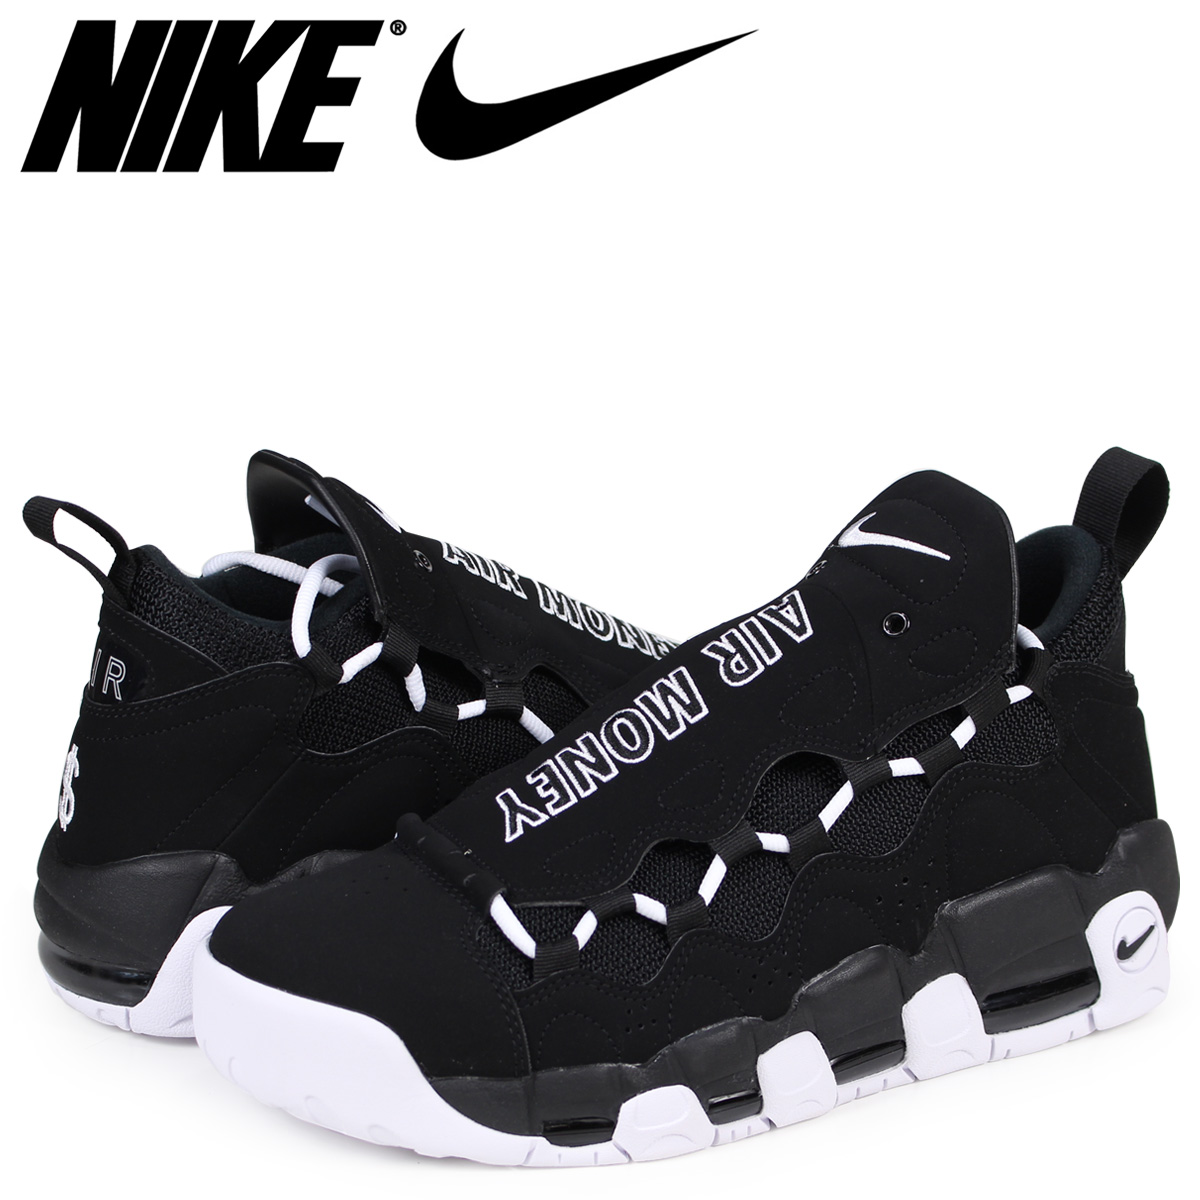 99af6950467 Nike NIKE air more money sneakers men AIR MORE MONEY BOLD CURRENCY AJ2998-001  black  3 9 Shinnyu load